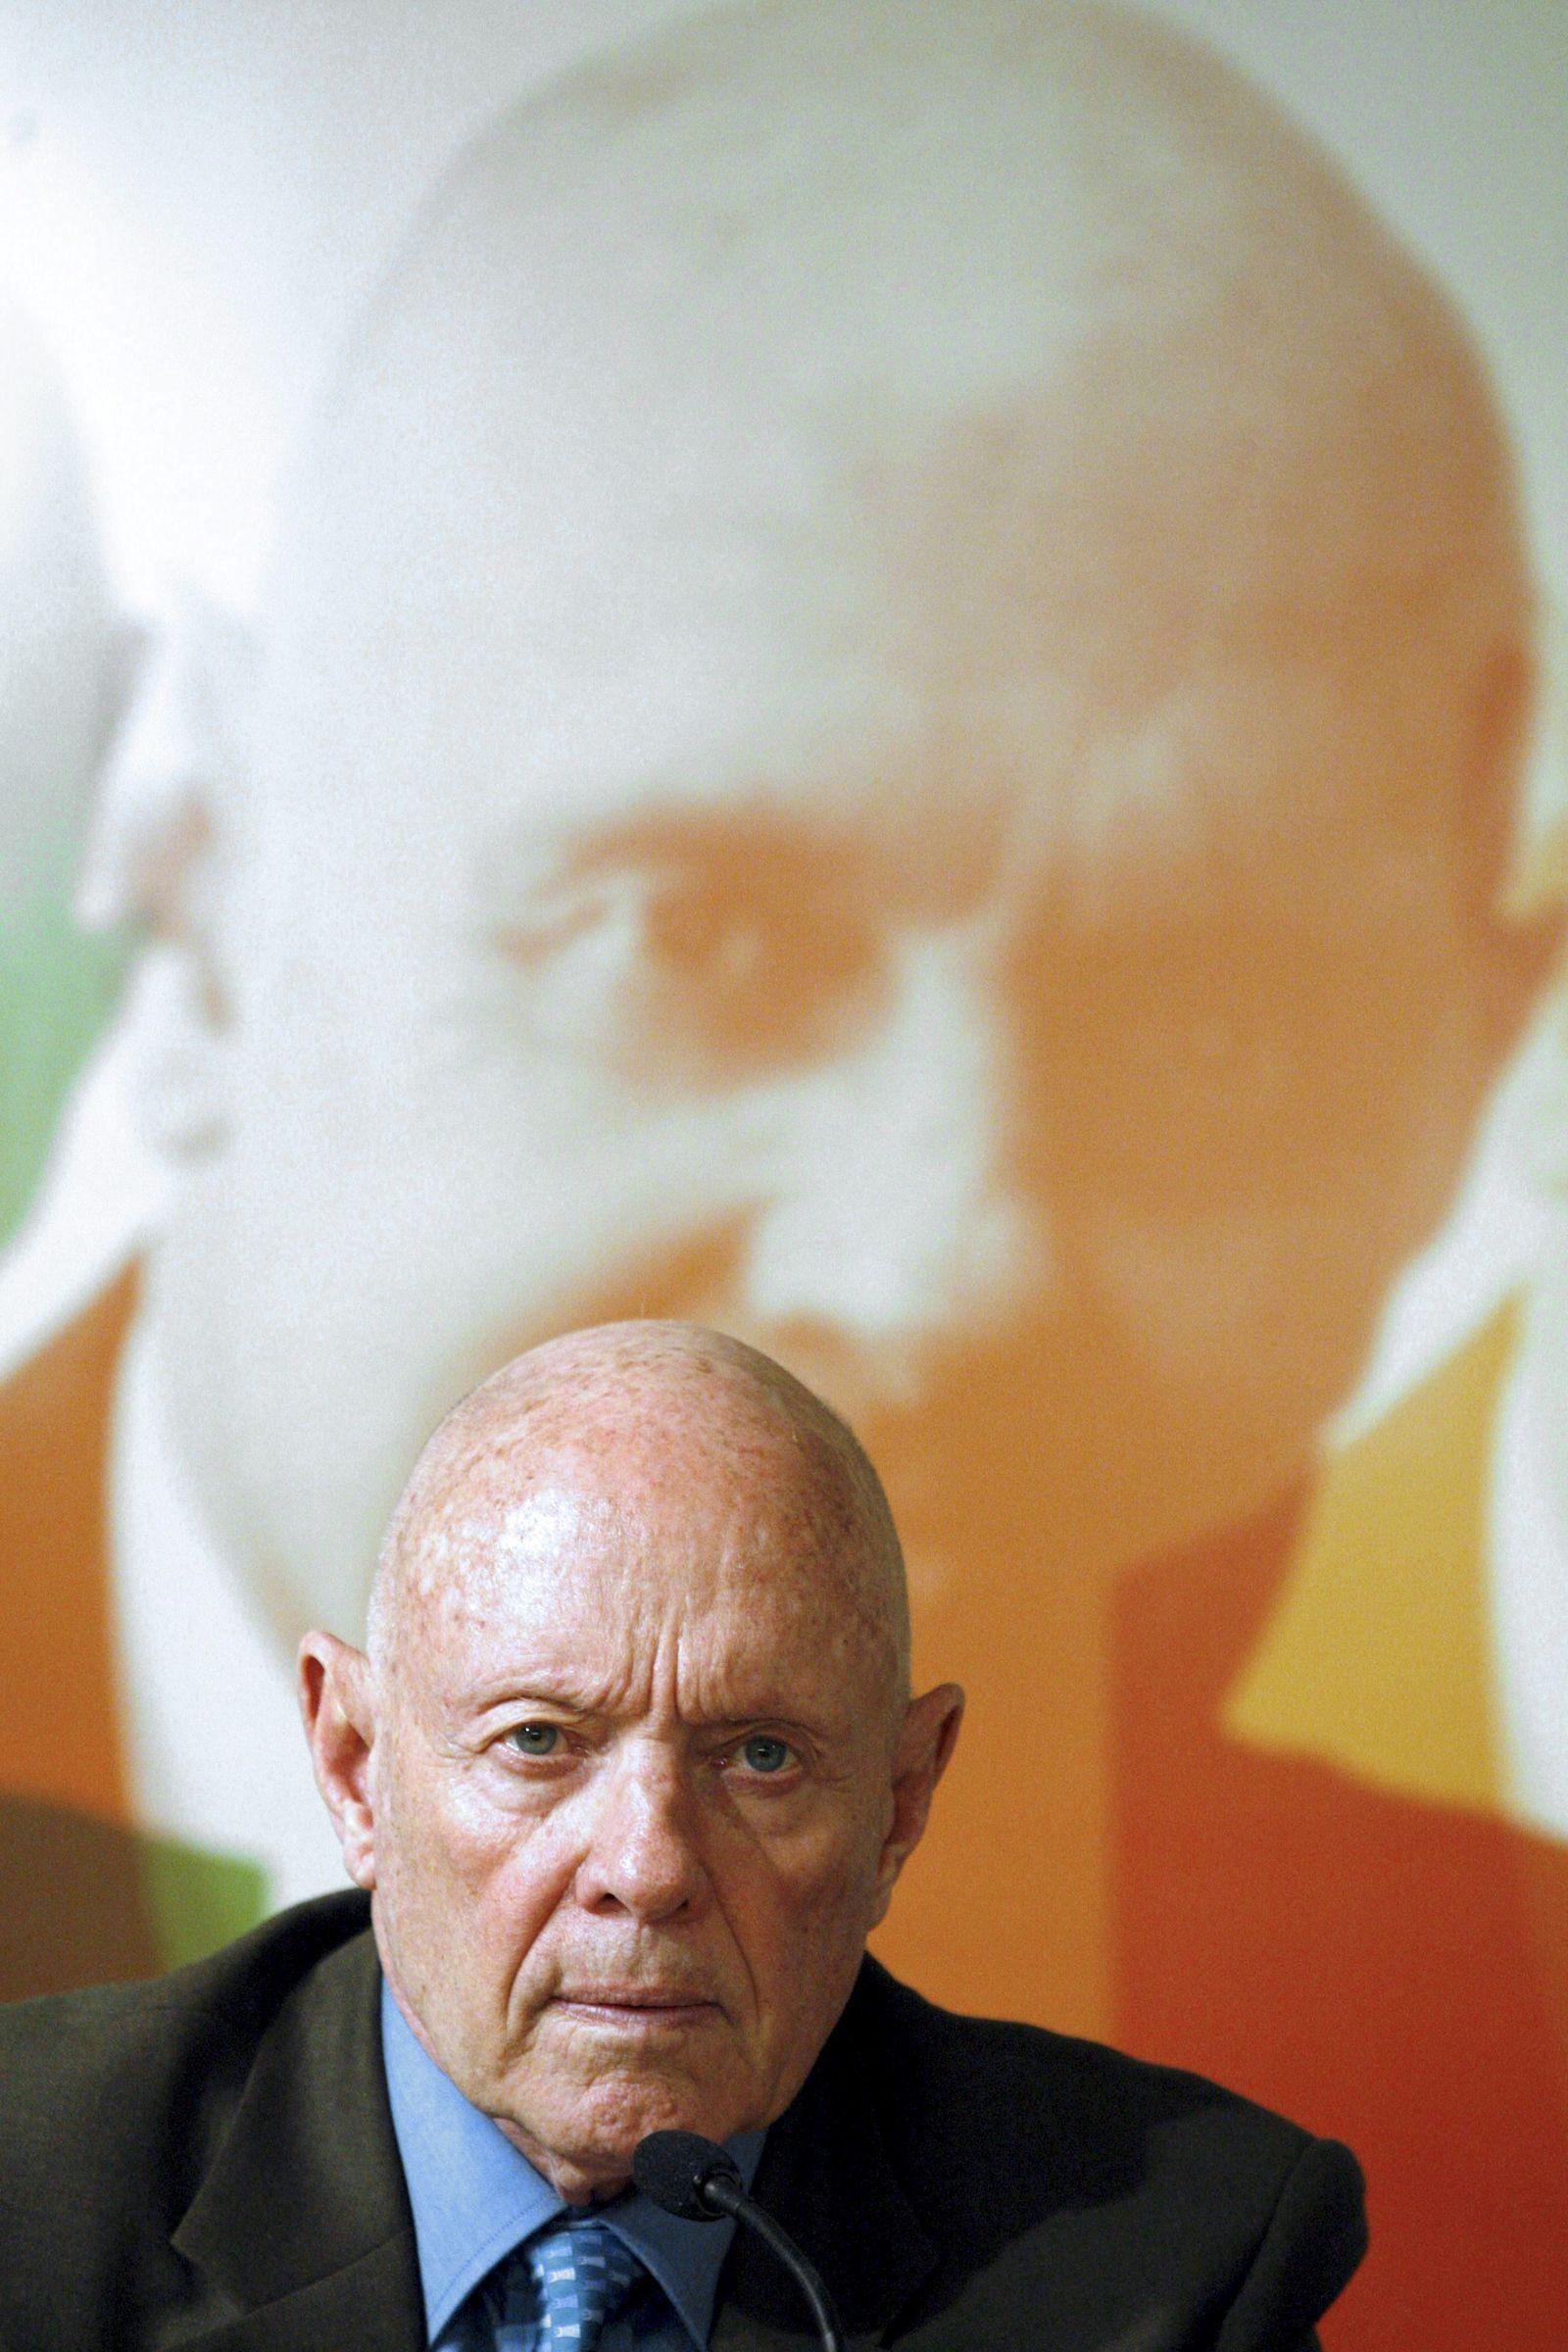 US leadership expert and writer Stephen R. Covey dies